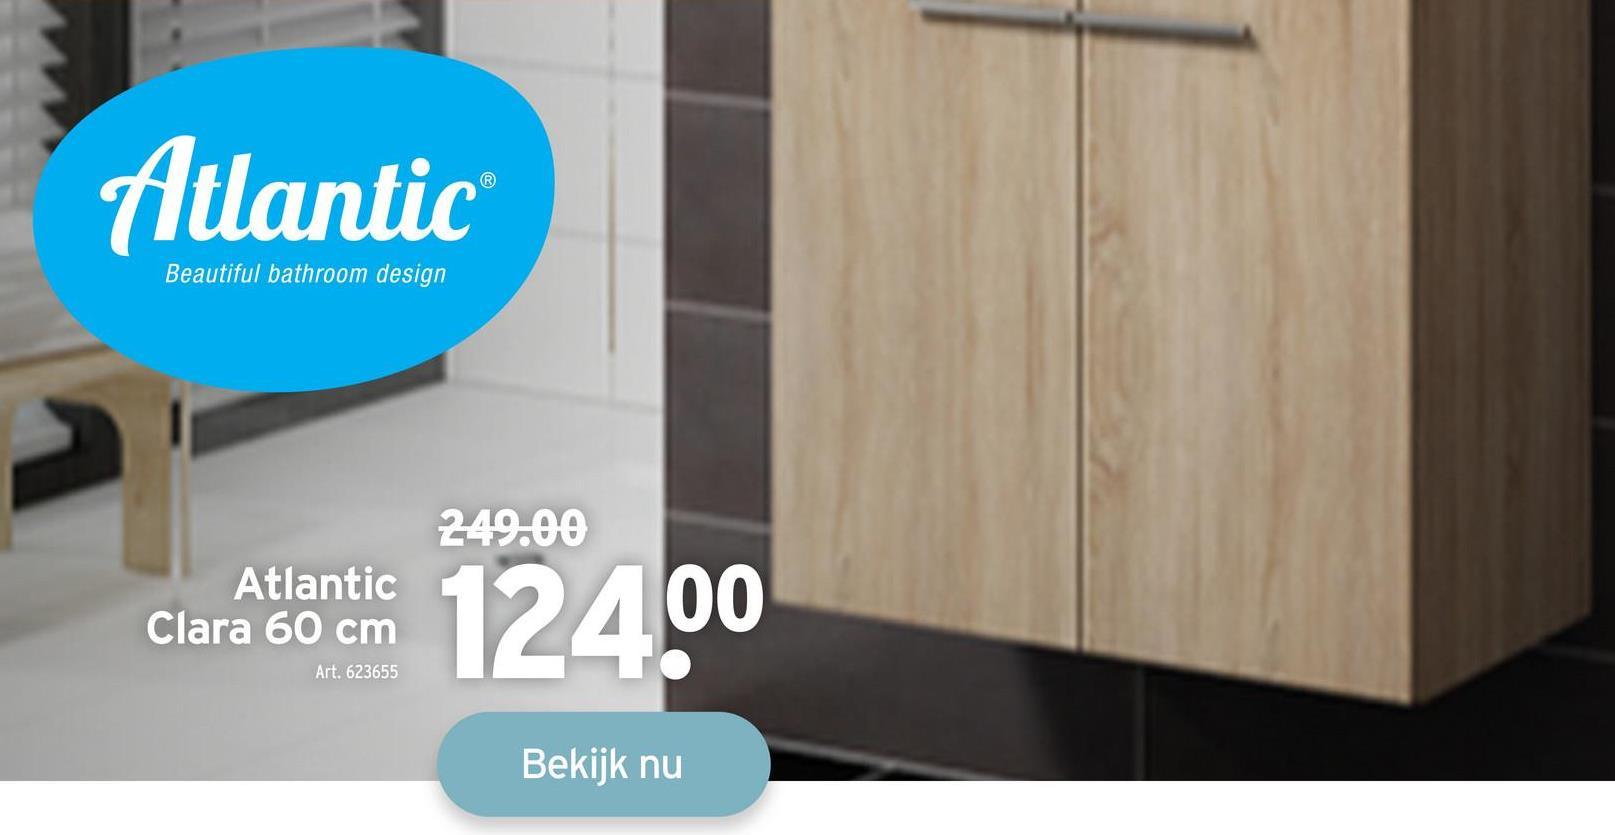 Atlantic Beautiful bathroom design 249.00 Atlantic Clara 60 cm 12400 Art. 623655 Bekijk nu